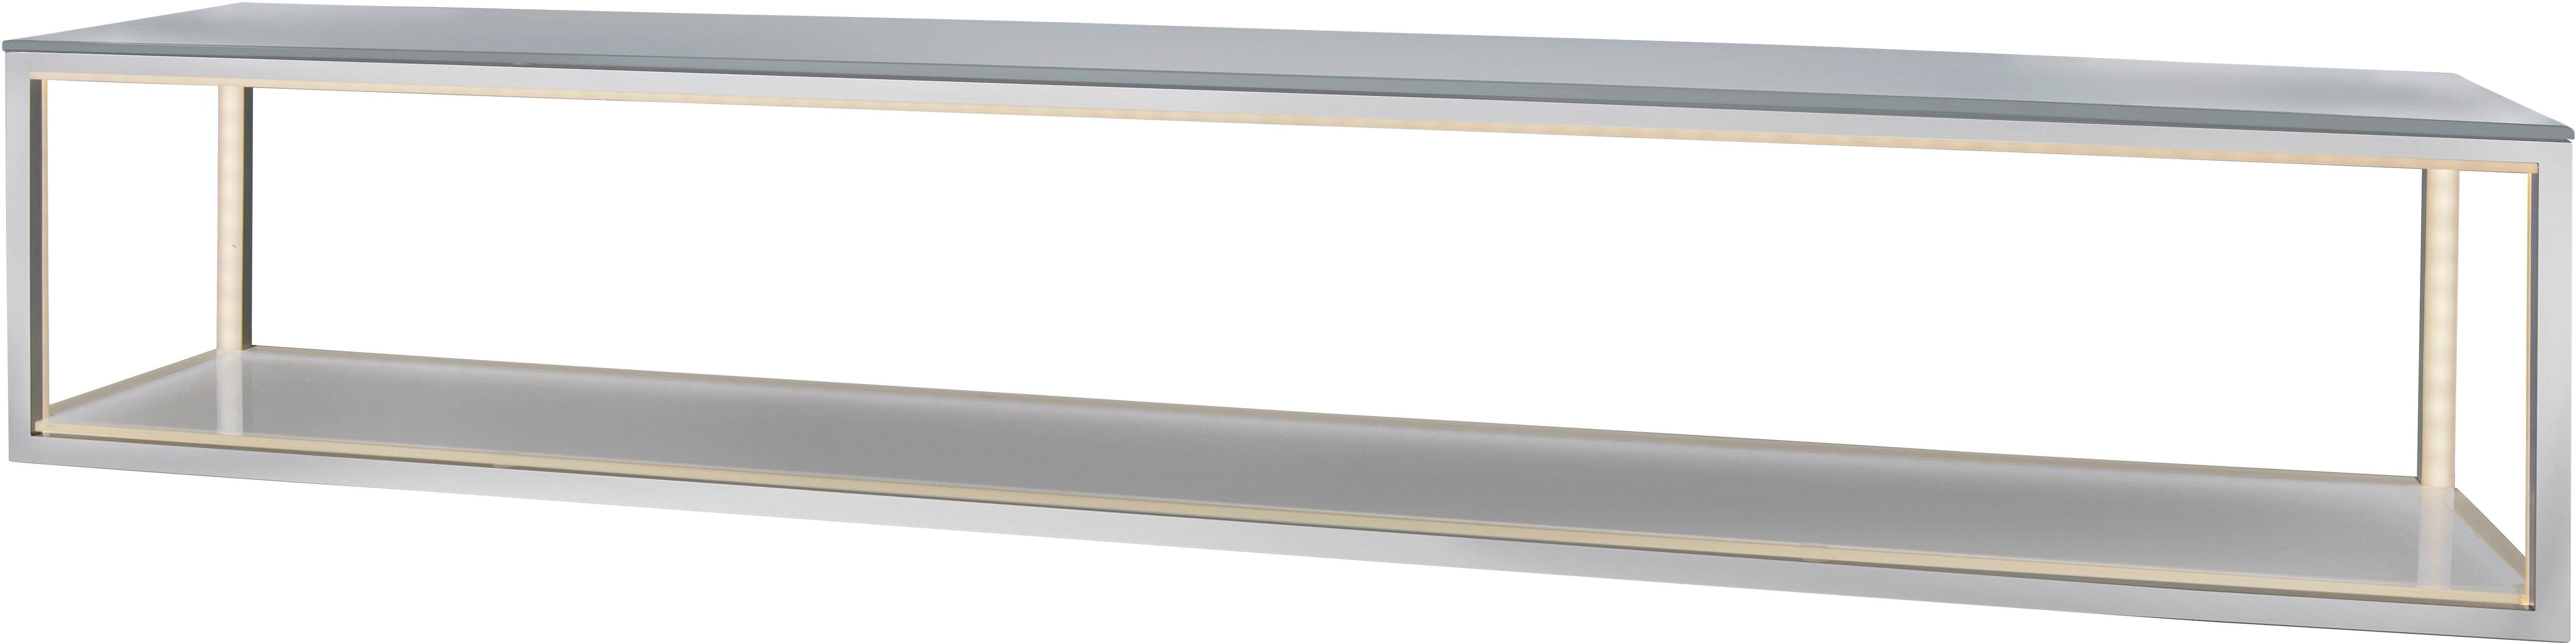 SOMPEX LED Wandleuchte Delux